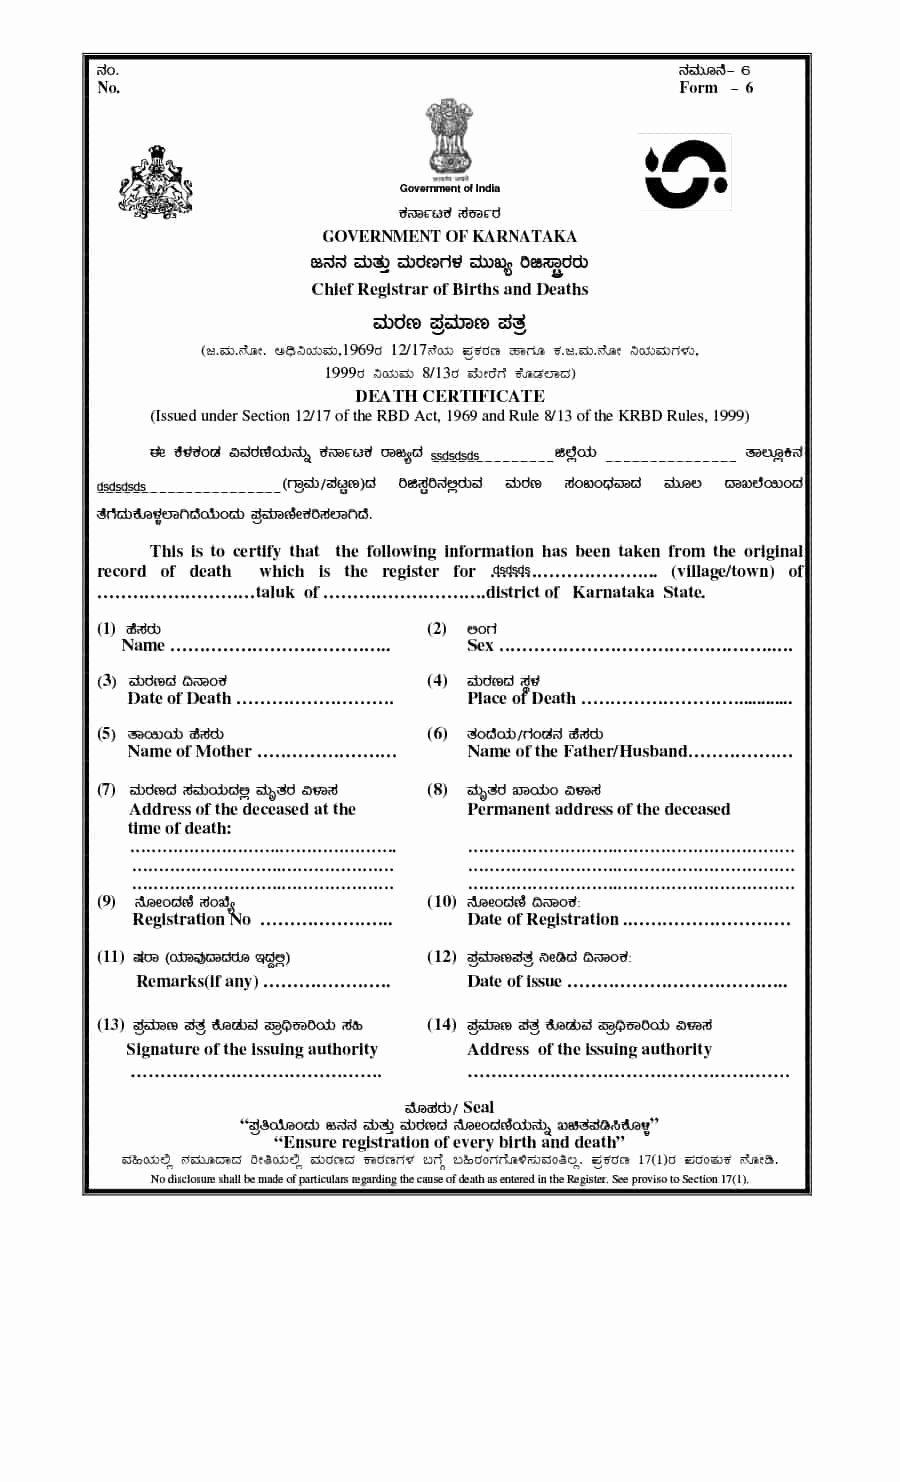 Georgia Death Certificate Template Lovely 37 Blank Death Certificate Templates [ Free]